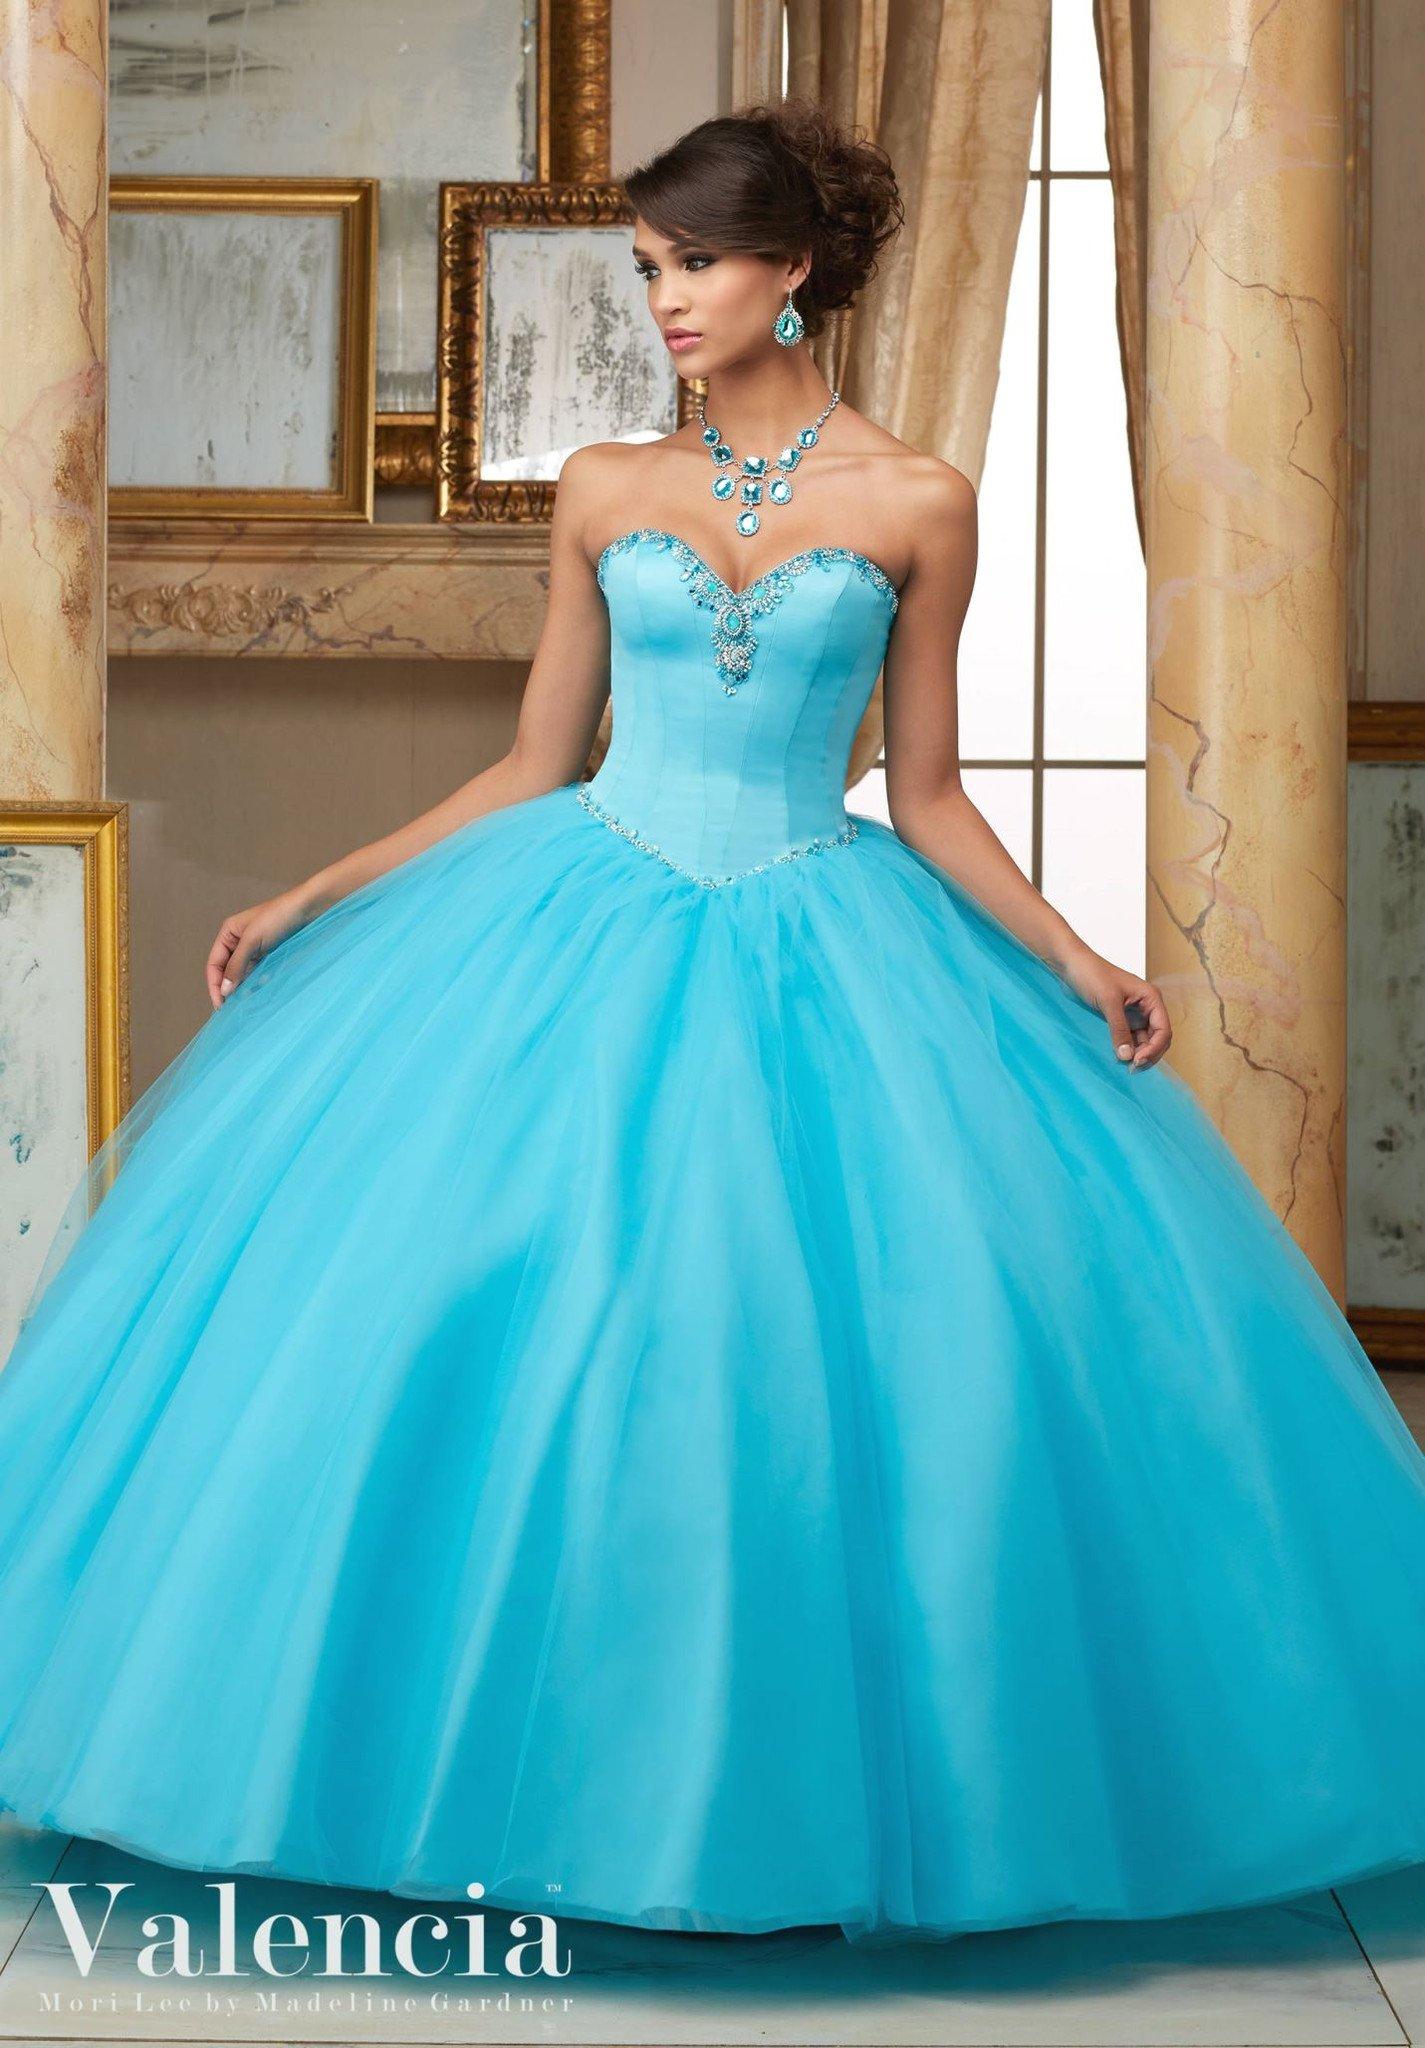 Mori Lee Valencia Quinceanera Dress 60005 Vestido Para 15